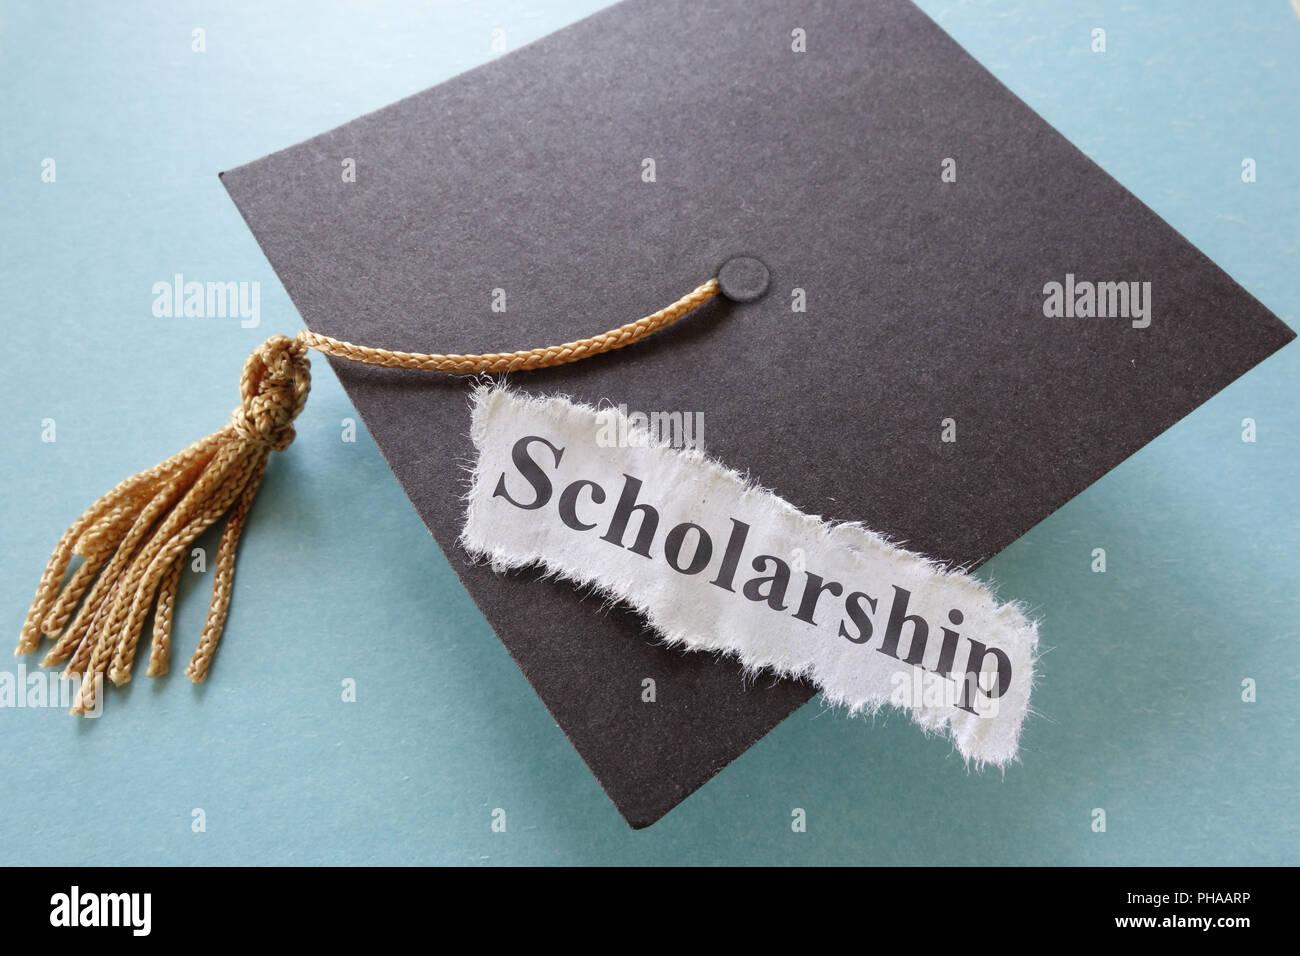 scholarship - Stock Image